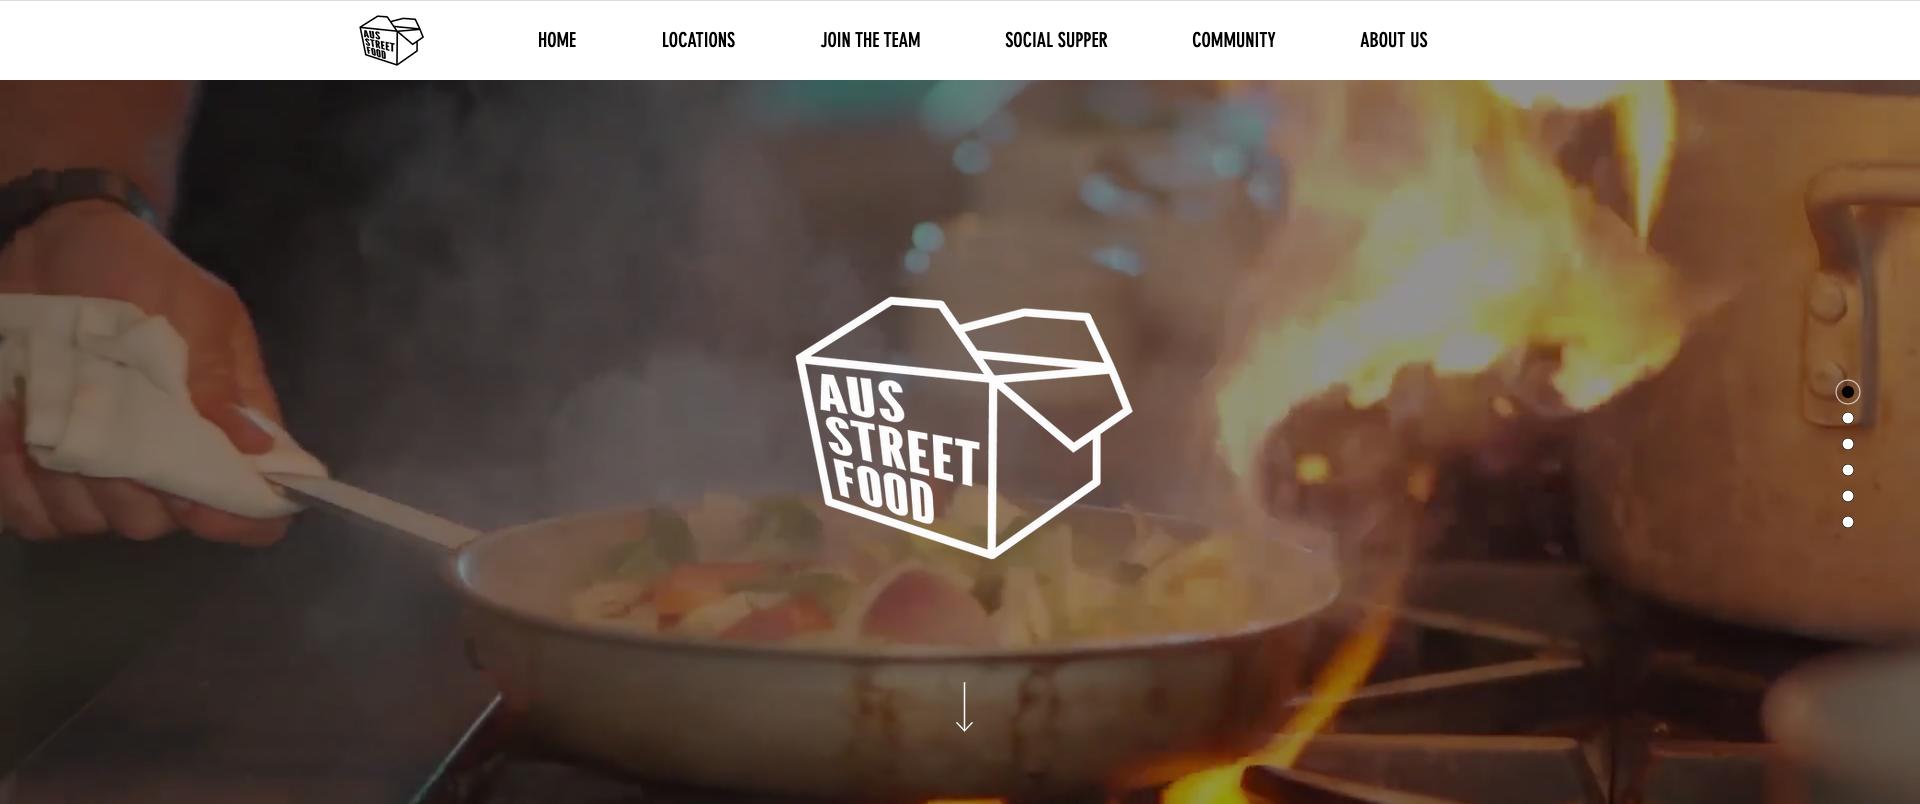 HOME | ausstreetfood